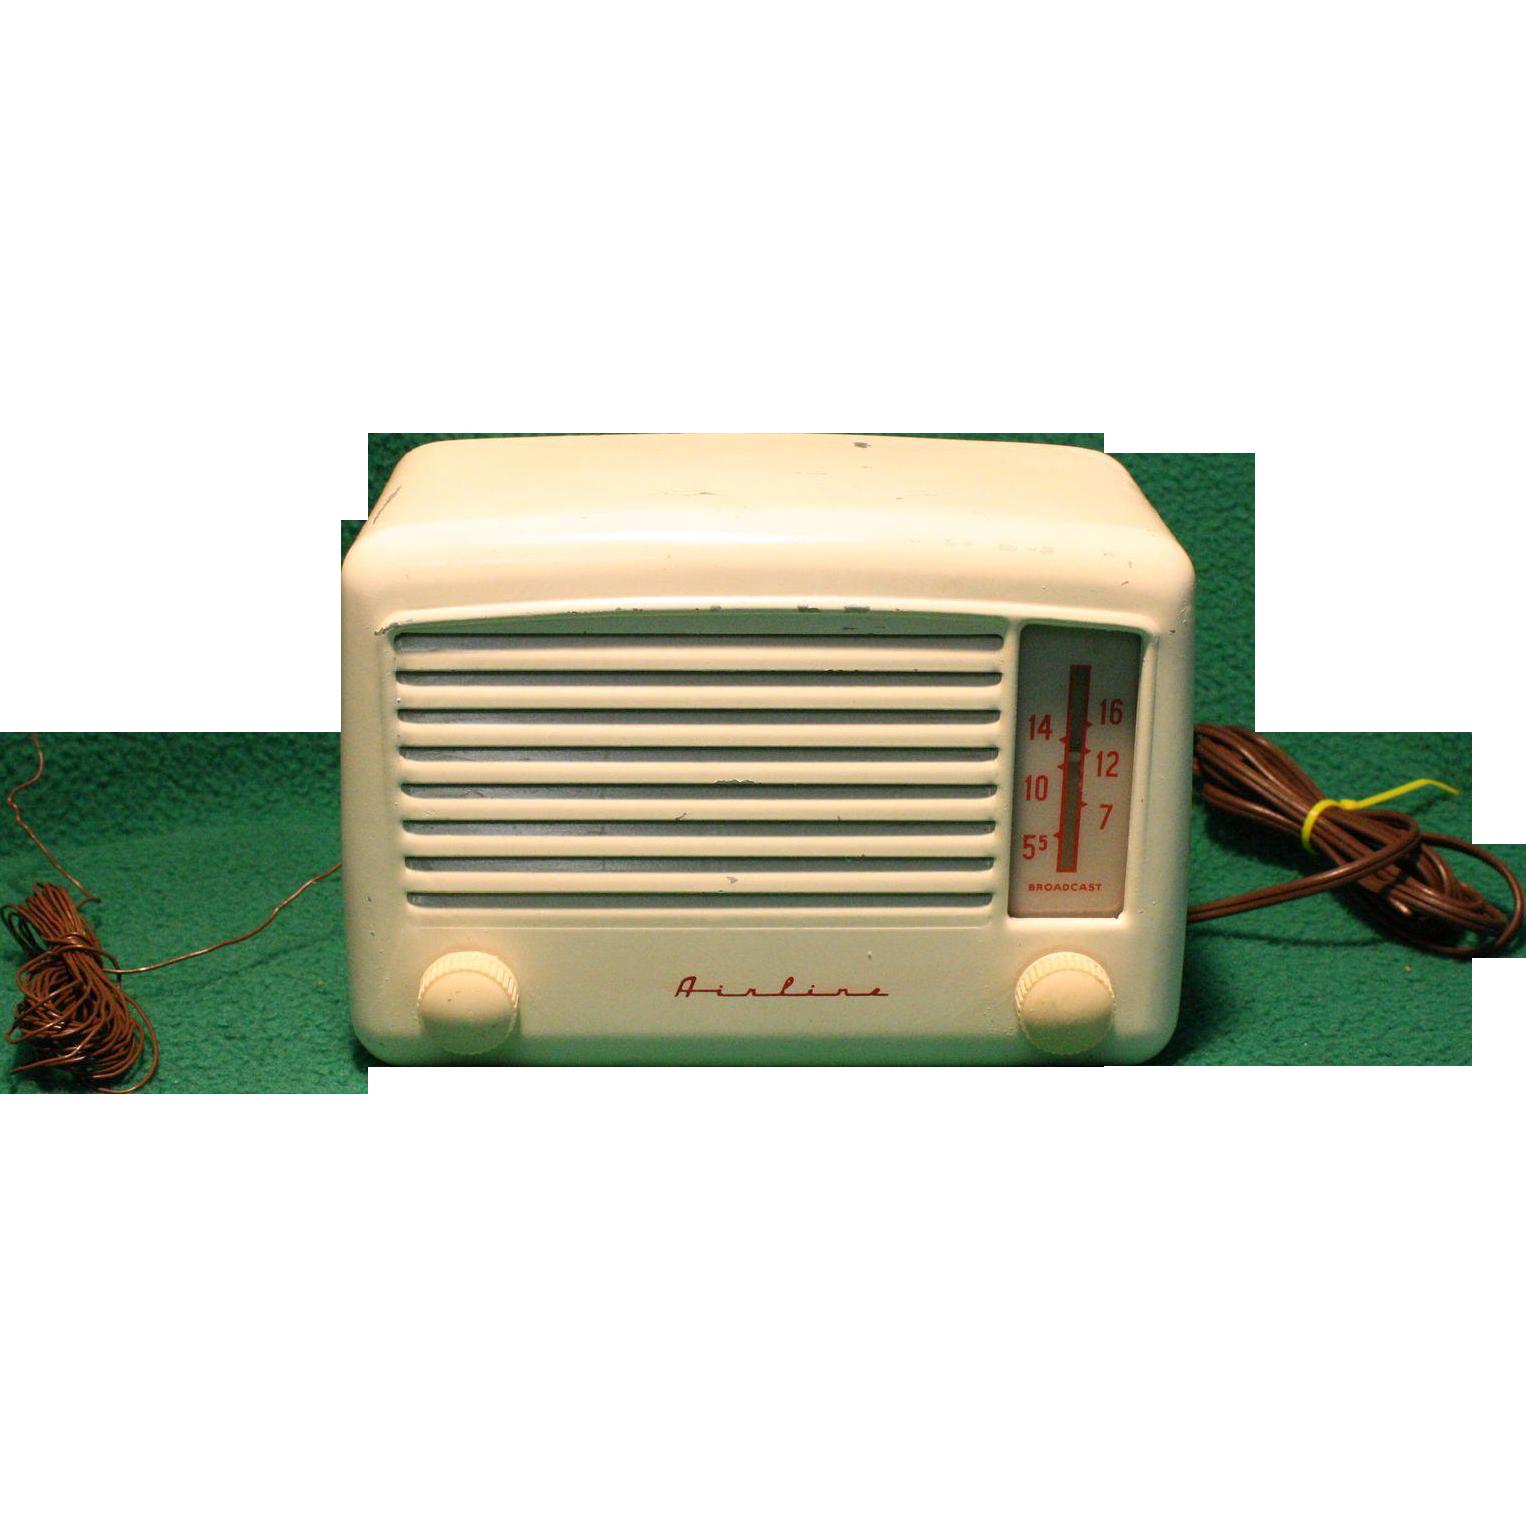 RCA Montgomery Ward Airline Radio 84KR1520B  Needs Repair